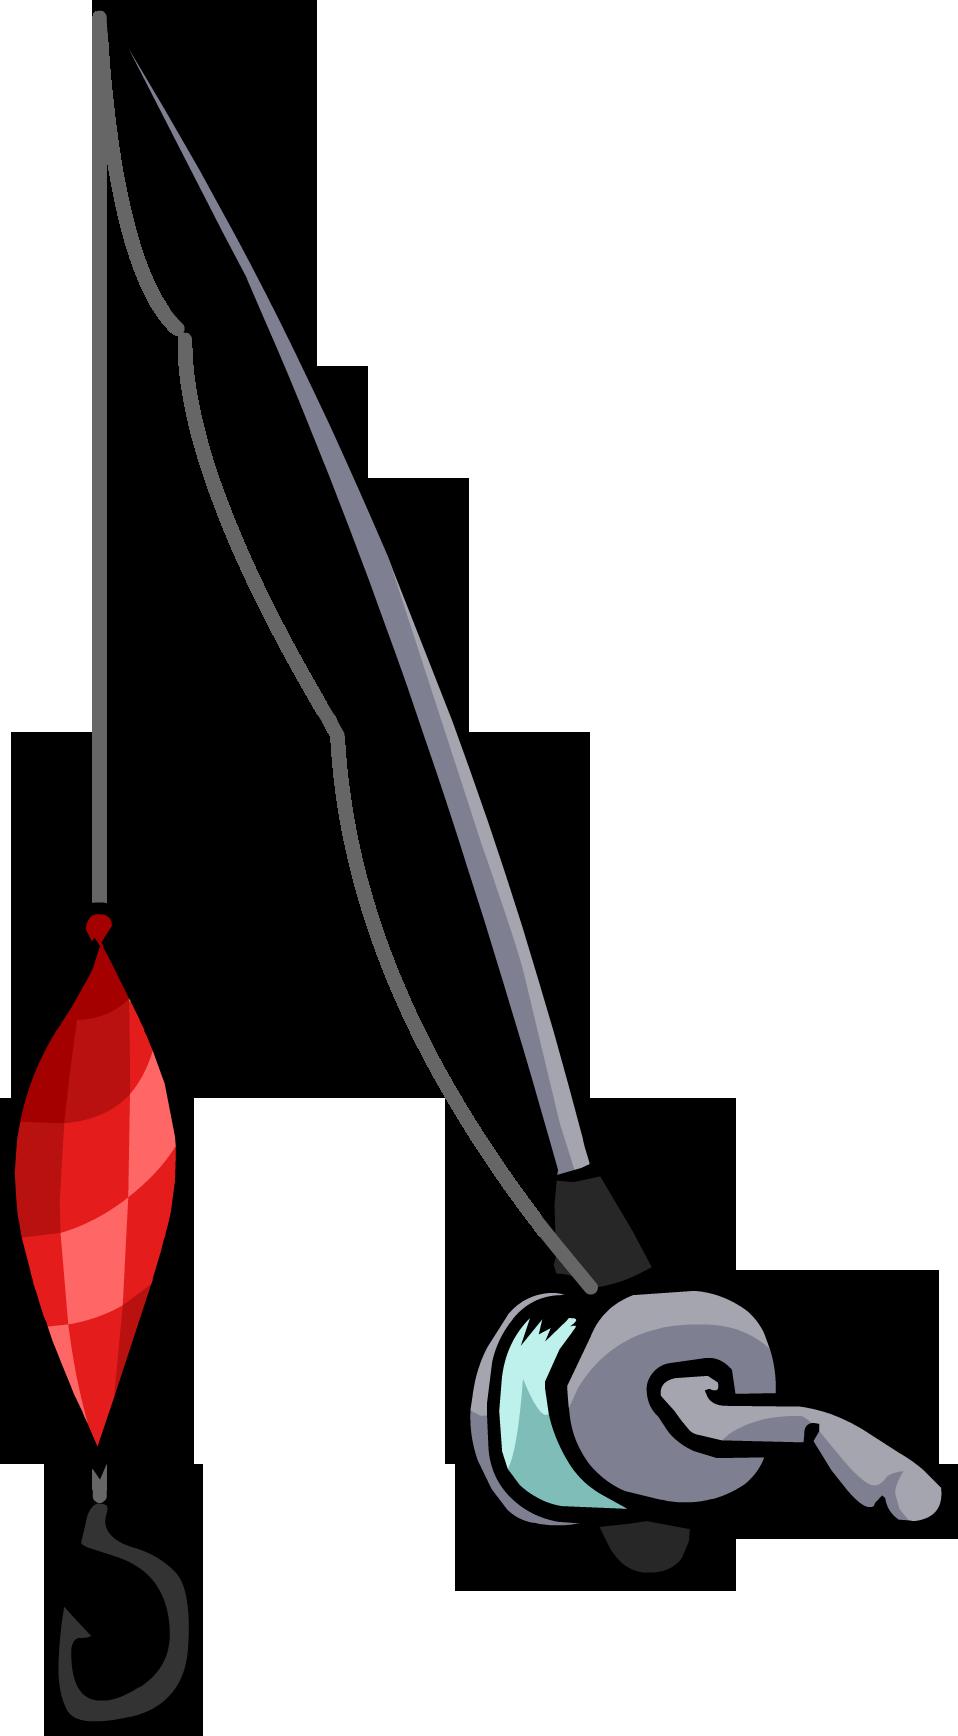 Fishing Rod clipart real Penguin Rod Fishing Rod Wiki